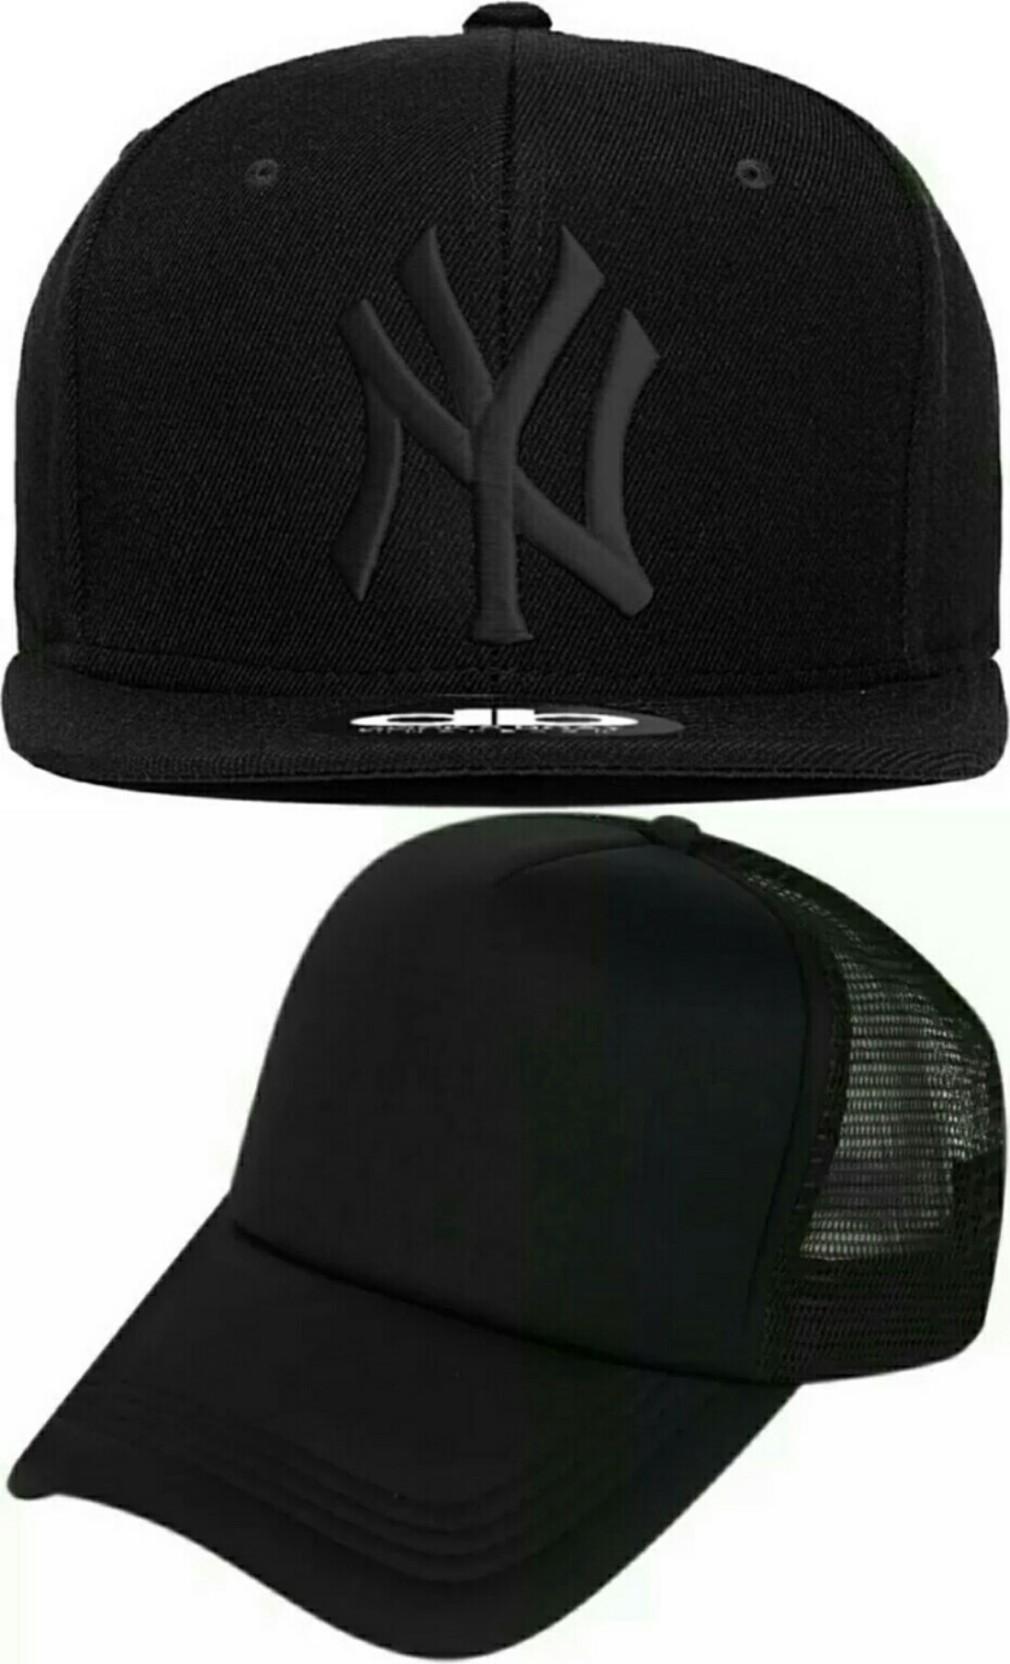 1c275a99e Friendskart Self Design 2 Caps Ny Hip Hop And Half Net In Baseball Style  Cap Cap